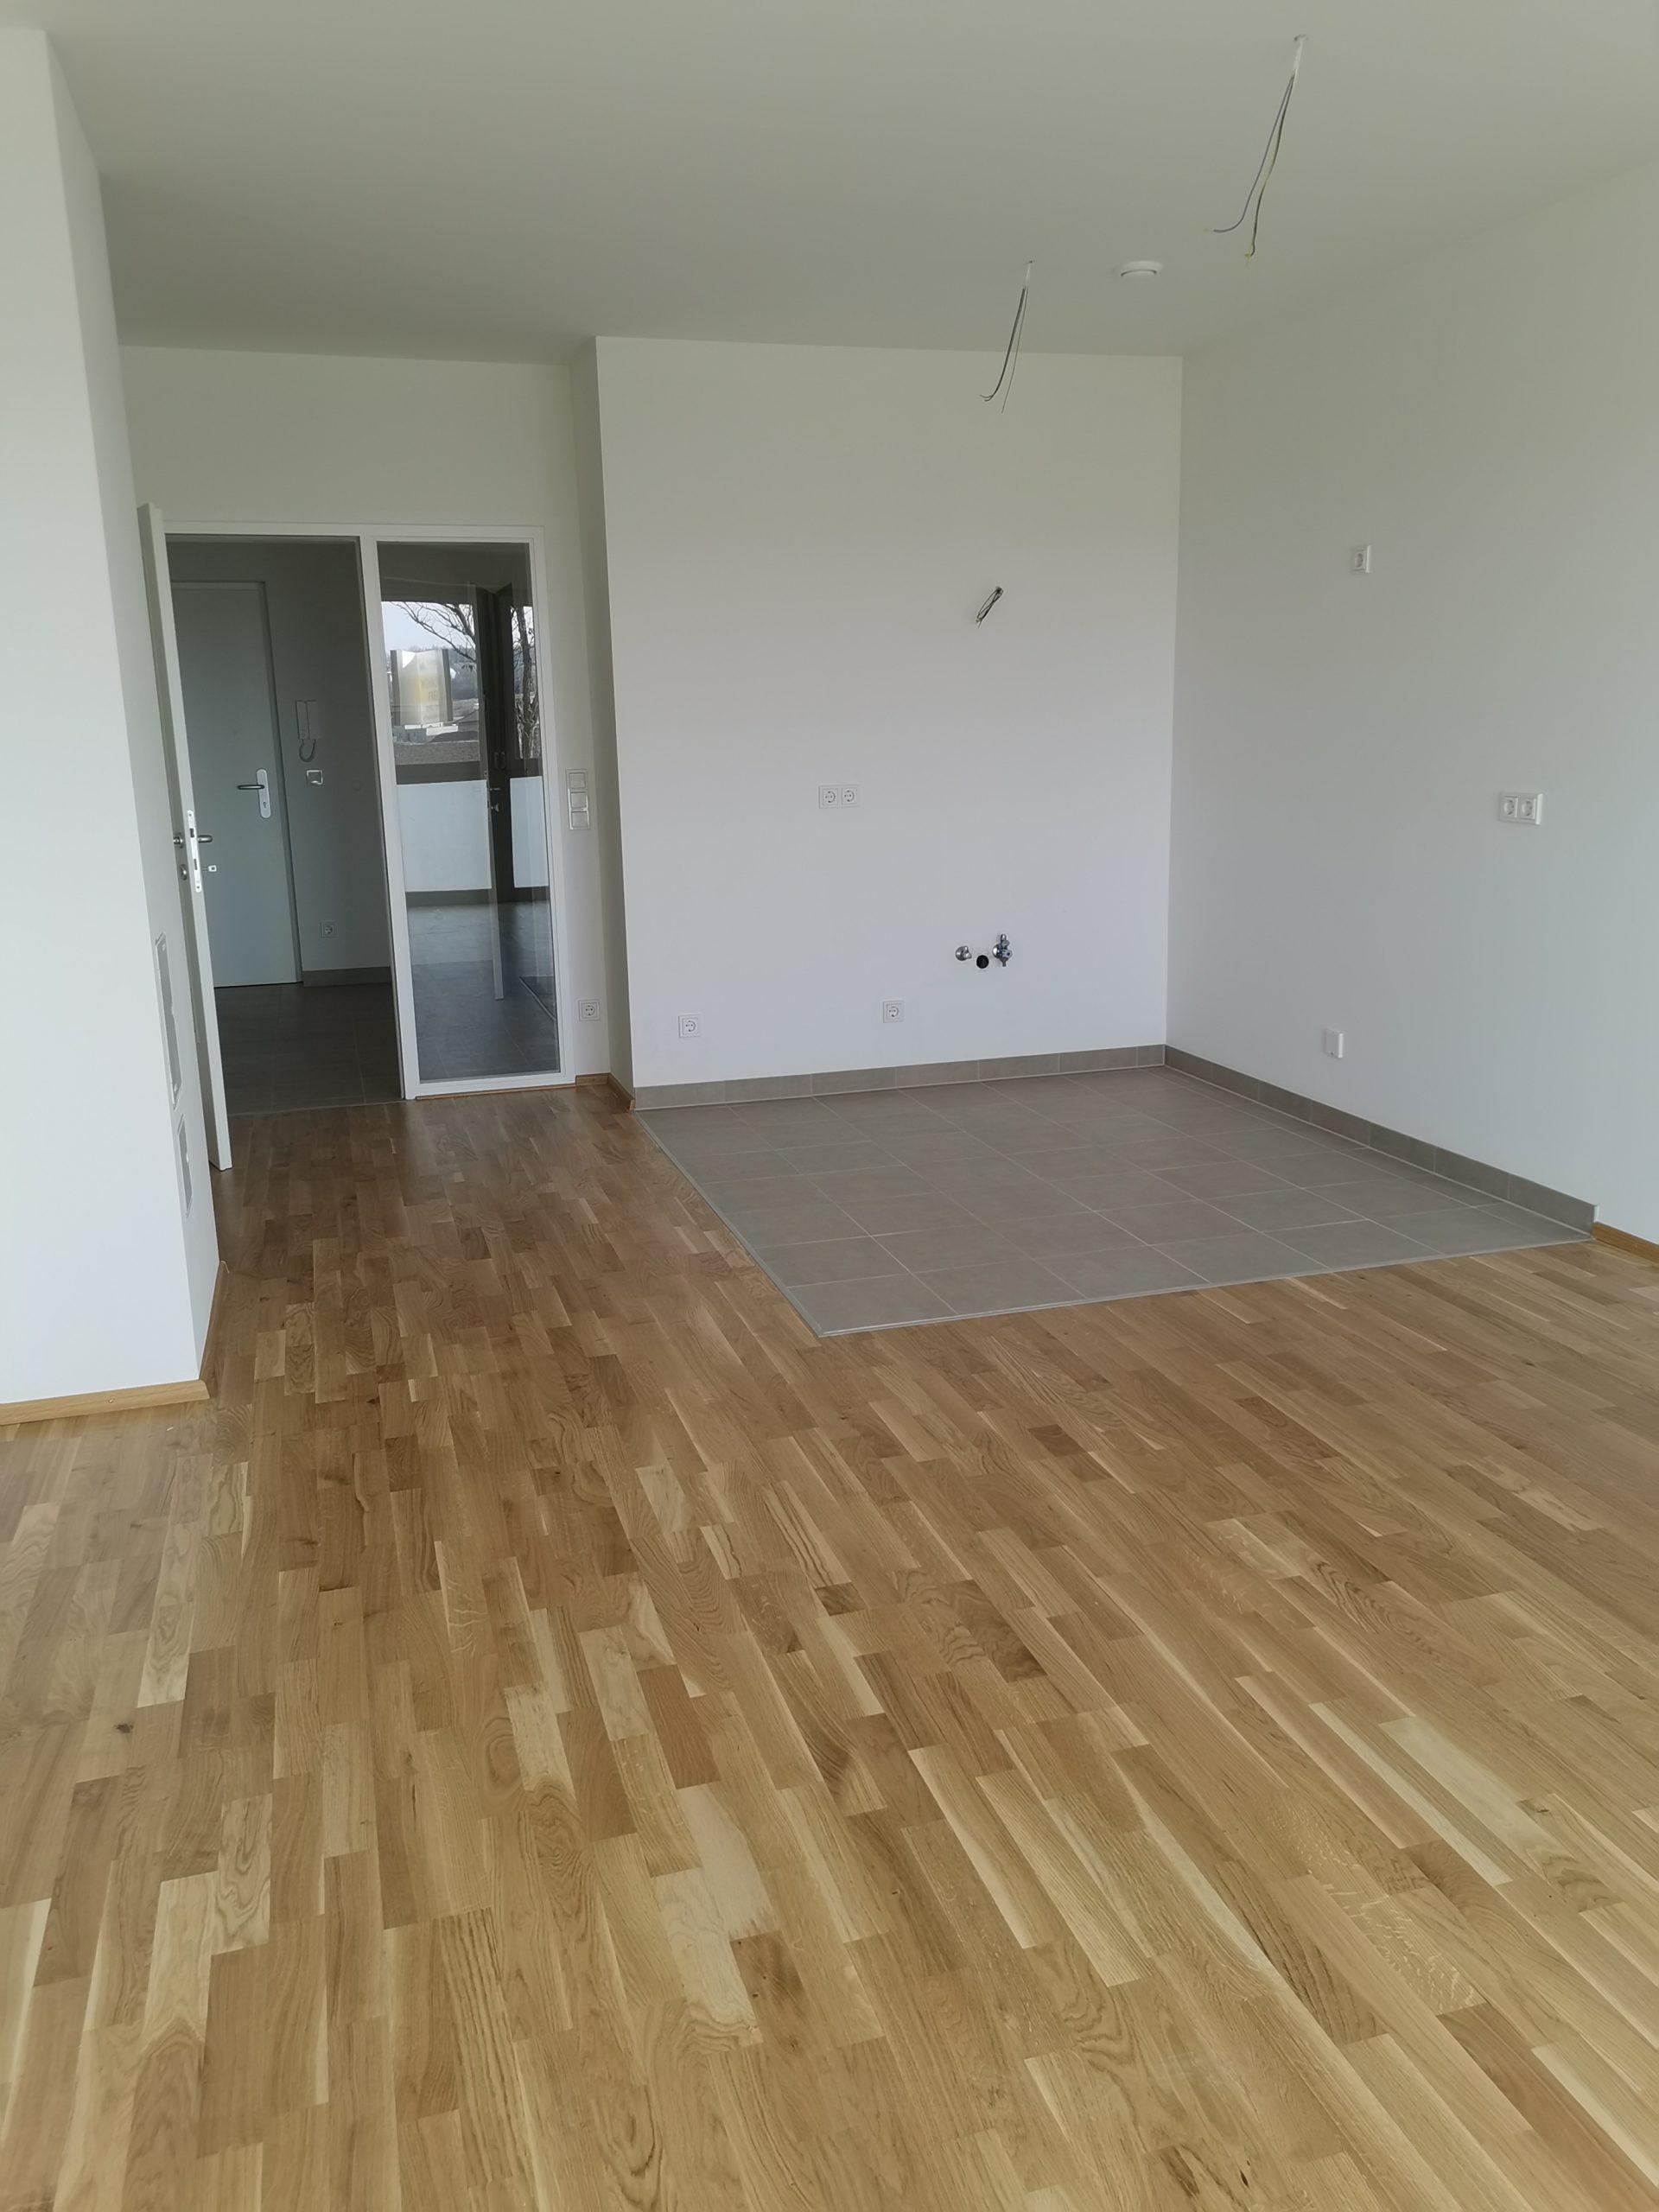 Immobilie von Kamptal in 3730 Eggenburg, Horn, Eggenburg VII - Top 207 #0